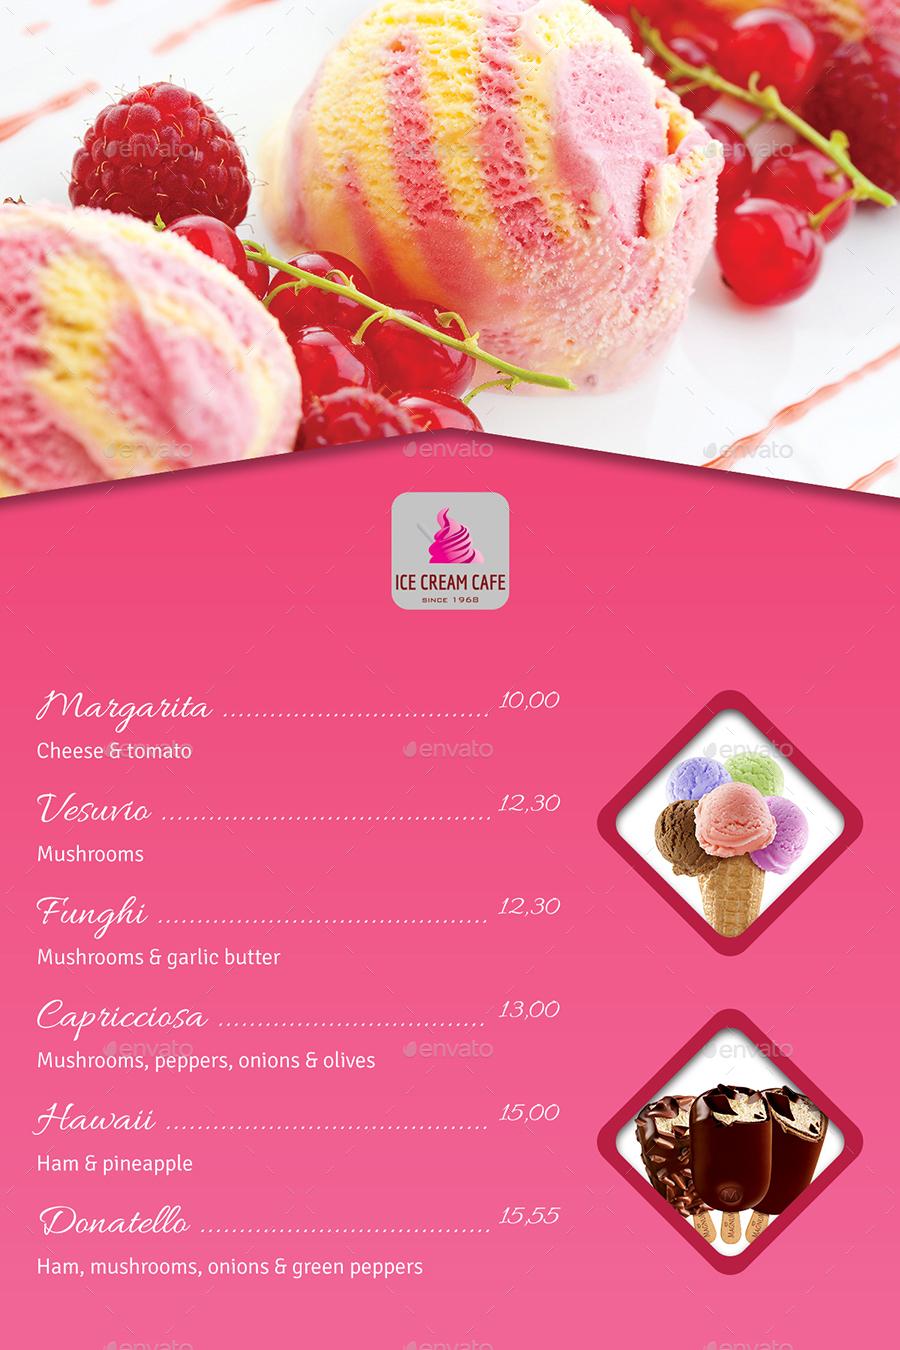 Ice Cream Table Tent Template Vol.2